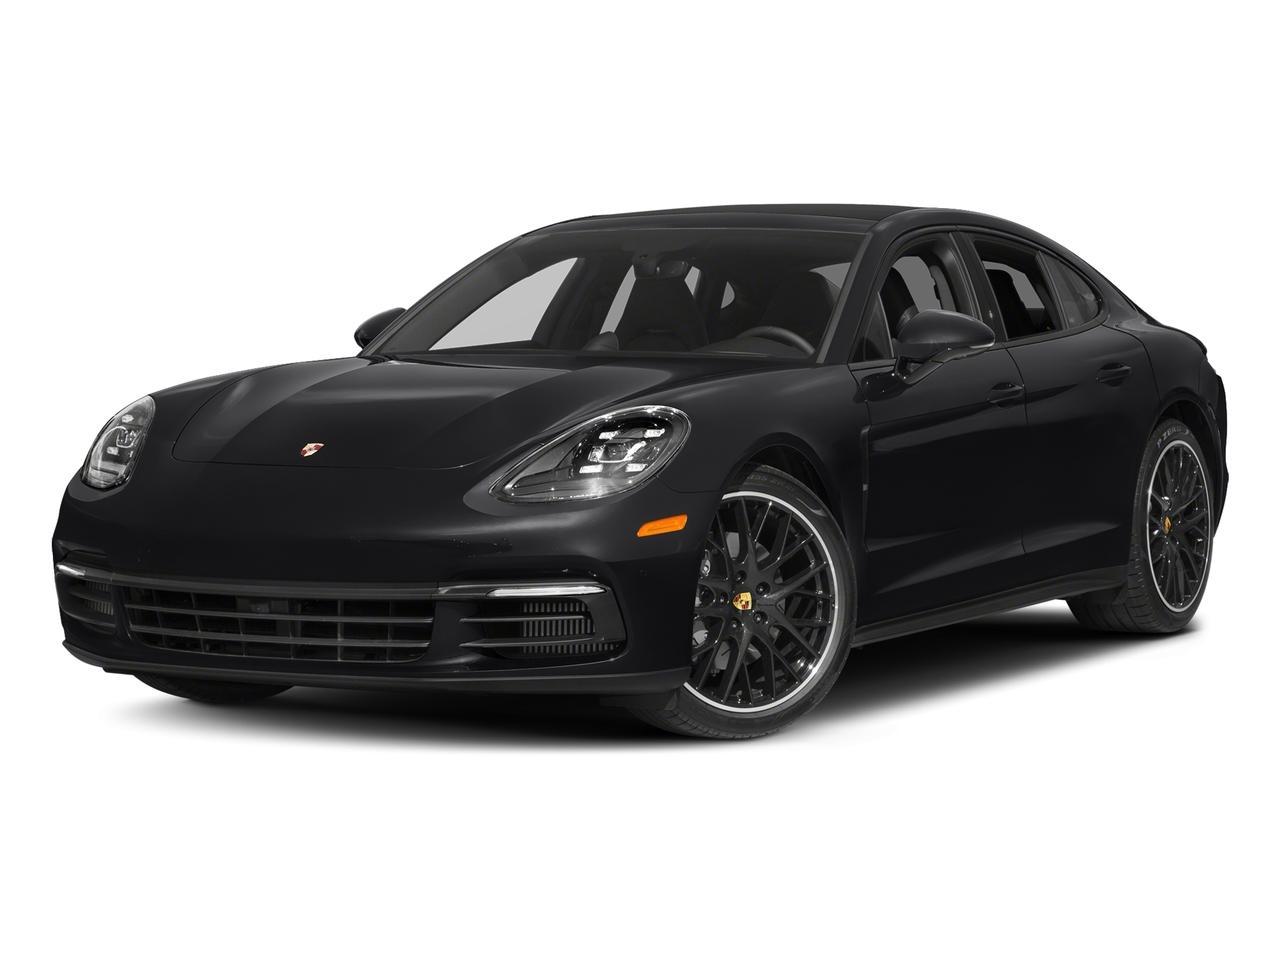 2017 Porsche Panamera Vehicle Photo in Appleton, WI 54913